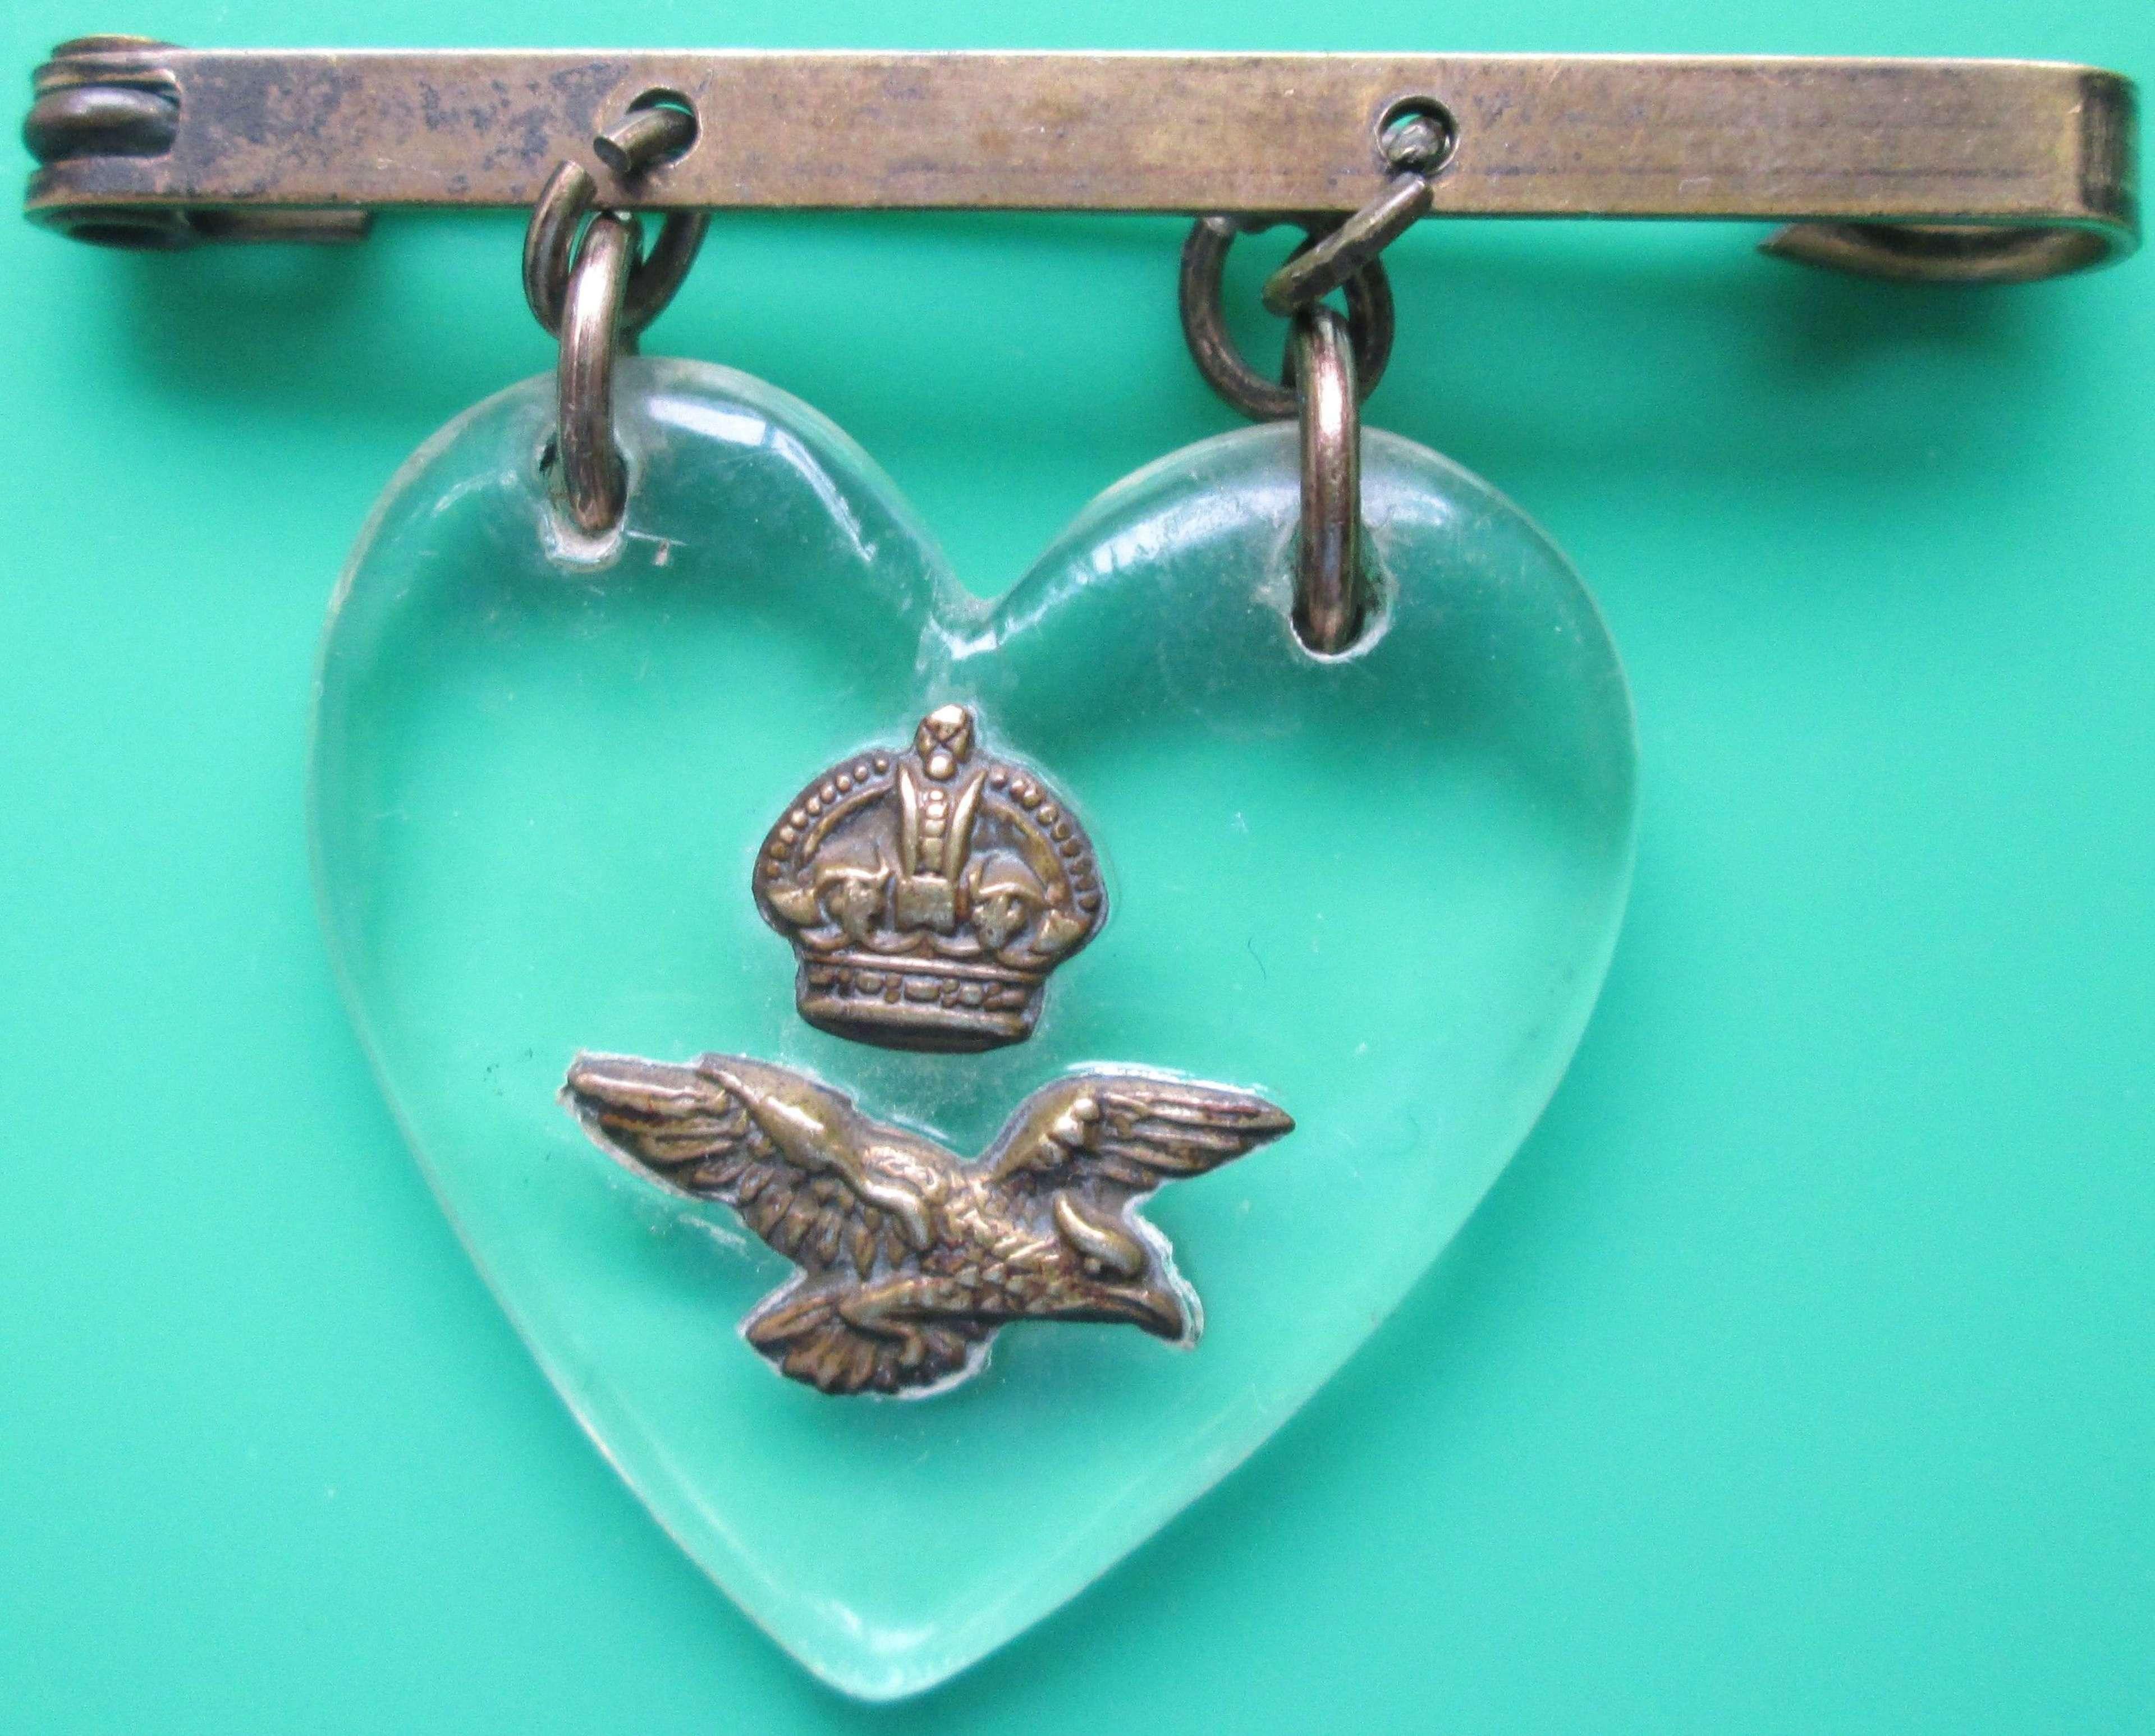 A WWII PERIOD RAF PERSPEX SWEETHEART BADGE